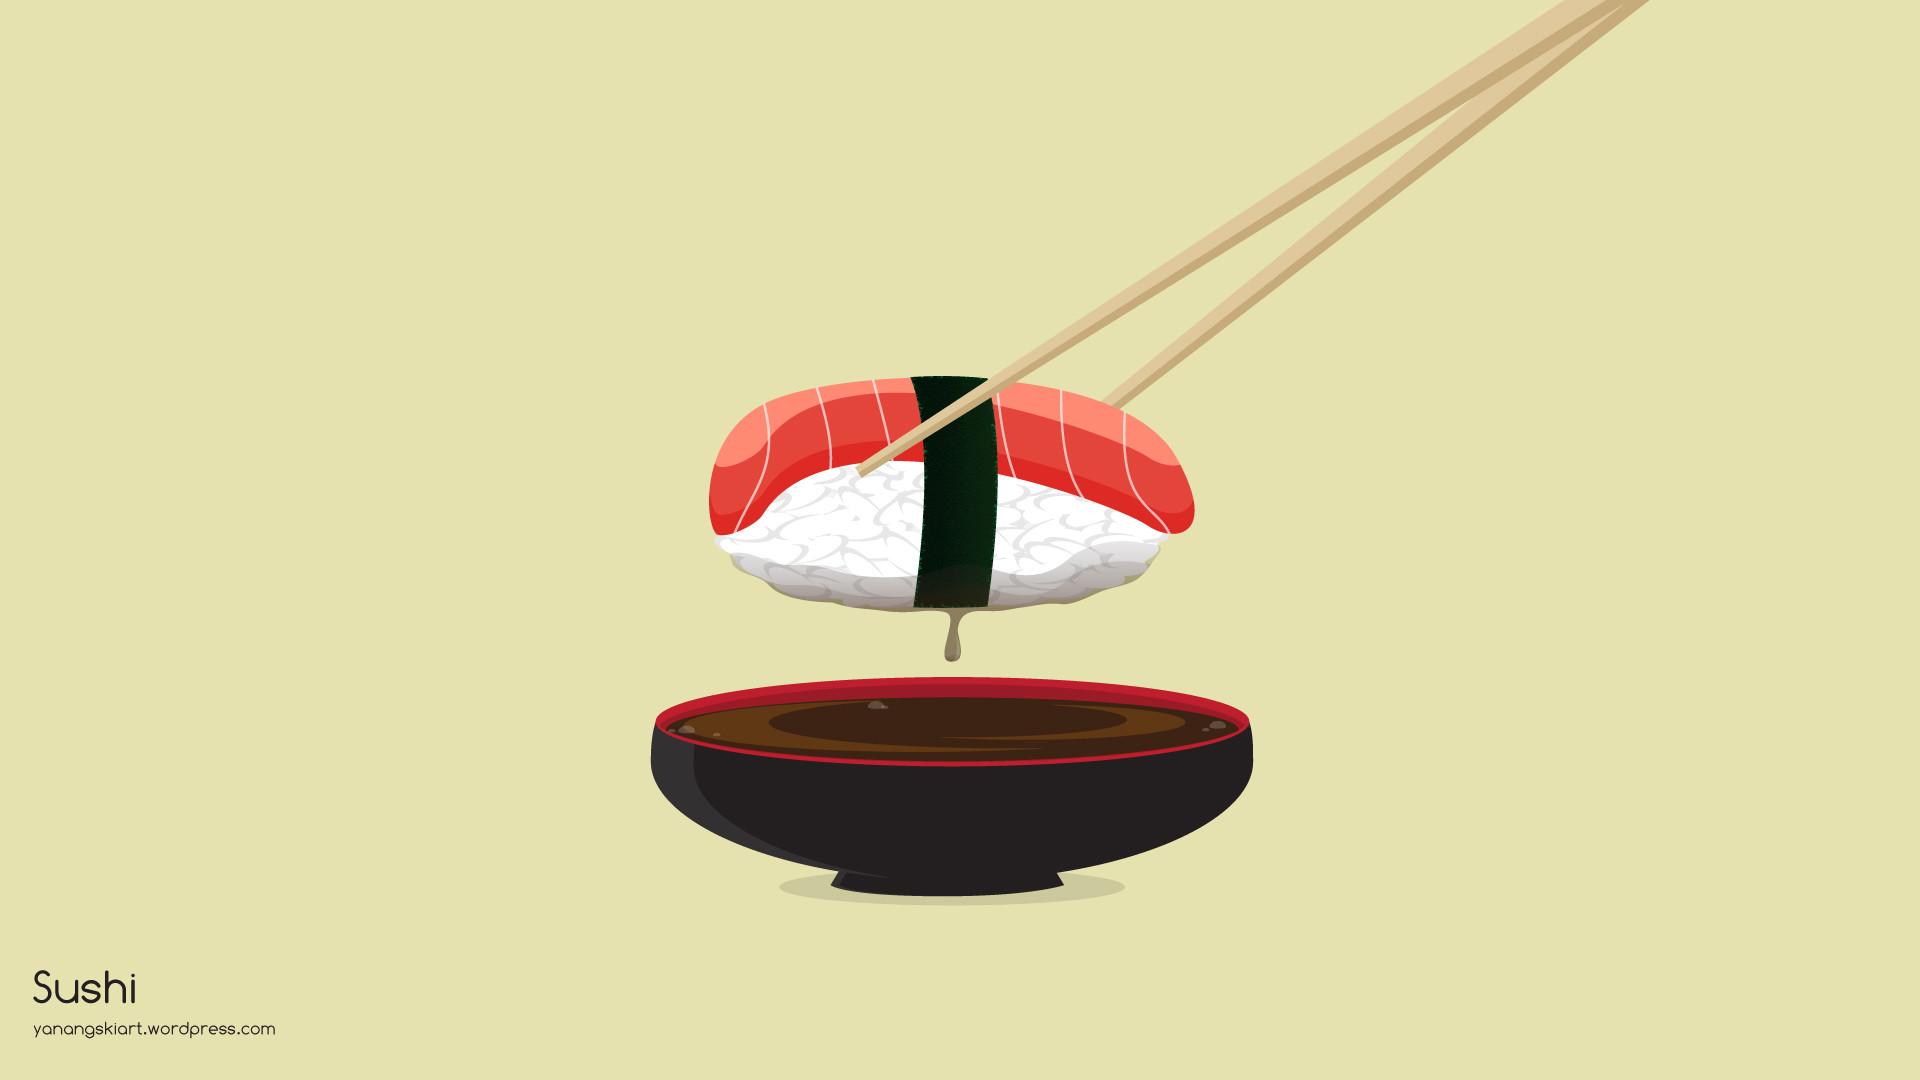 Cute Pug Wallpapers For Iphone Kawaii Sushi Wallpaper 62 Immagini